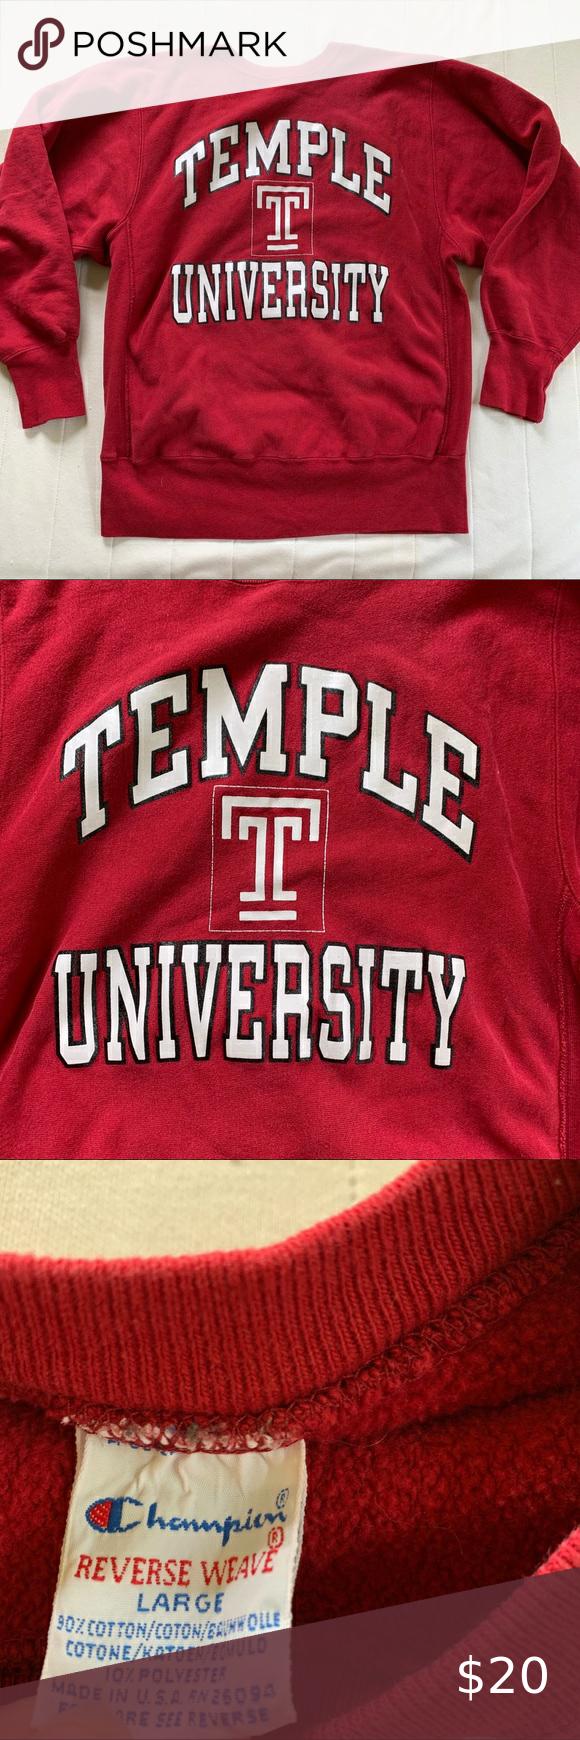 Temple University College Vsco Oversized Crewneck Oversized Crewneck Temple University Colleges And Universities [ 1740 x 580 Pixel ]